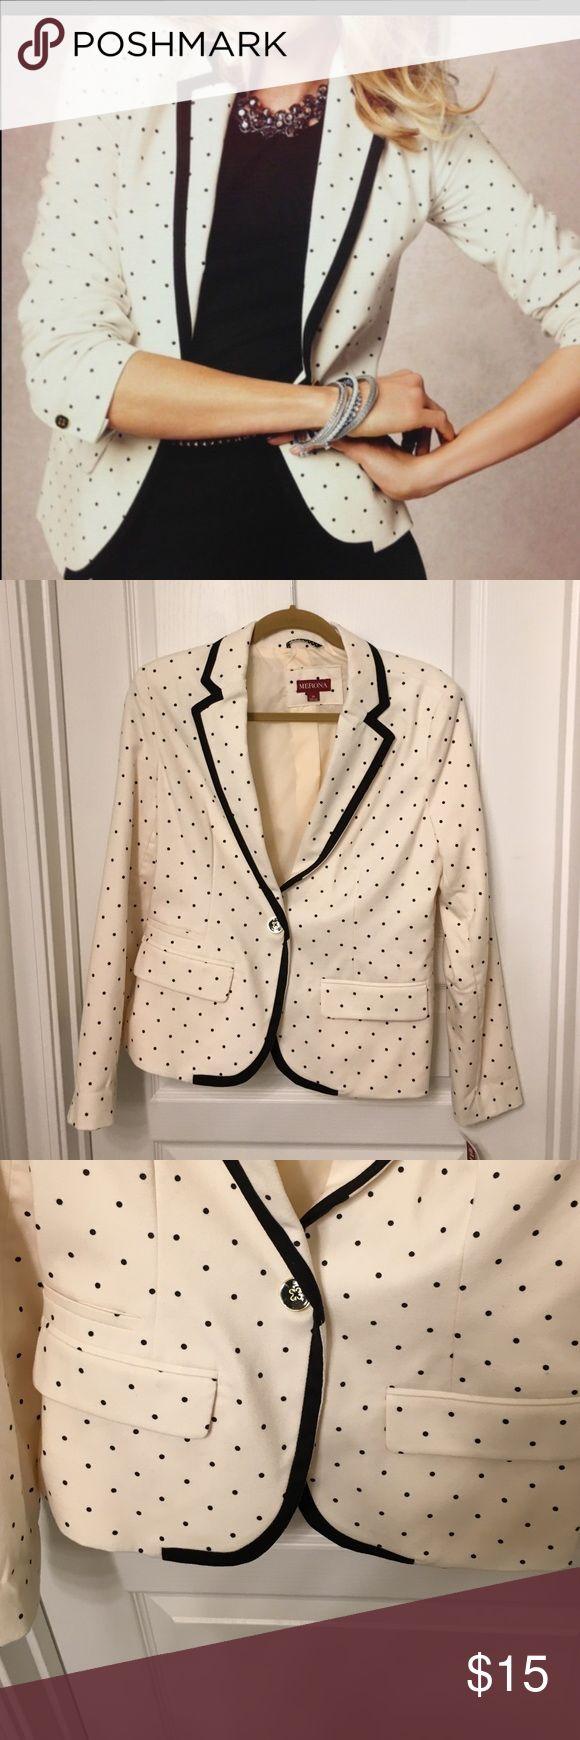 New Merona Polka Dot Blazer New Merona Polka Dot Blazer Merona Jackets & Coats Blazers